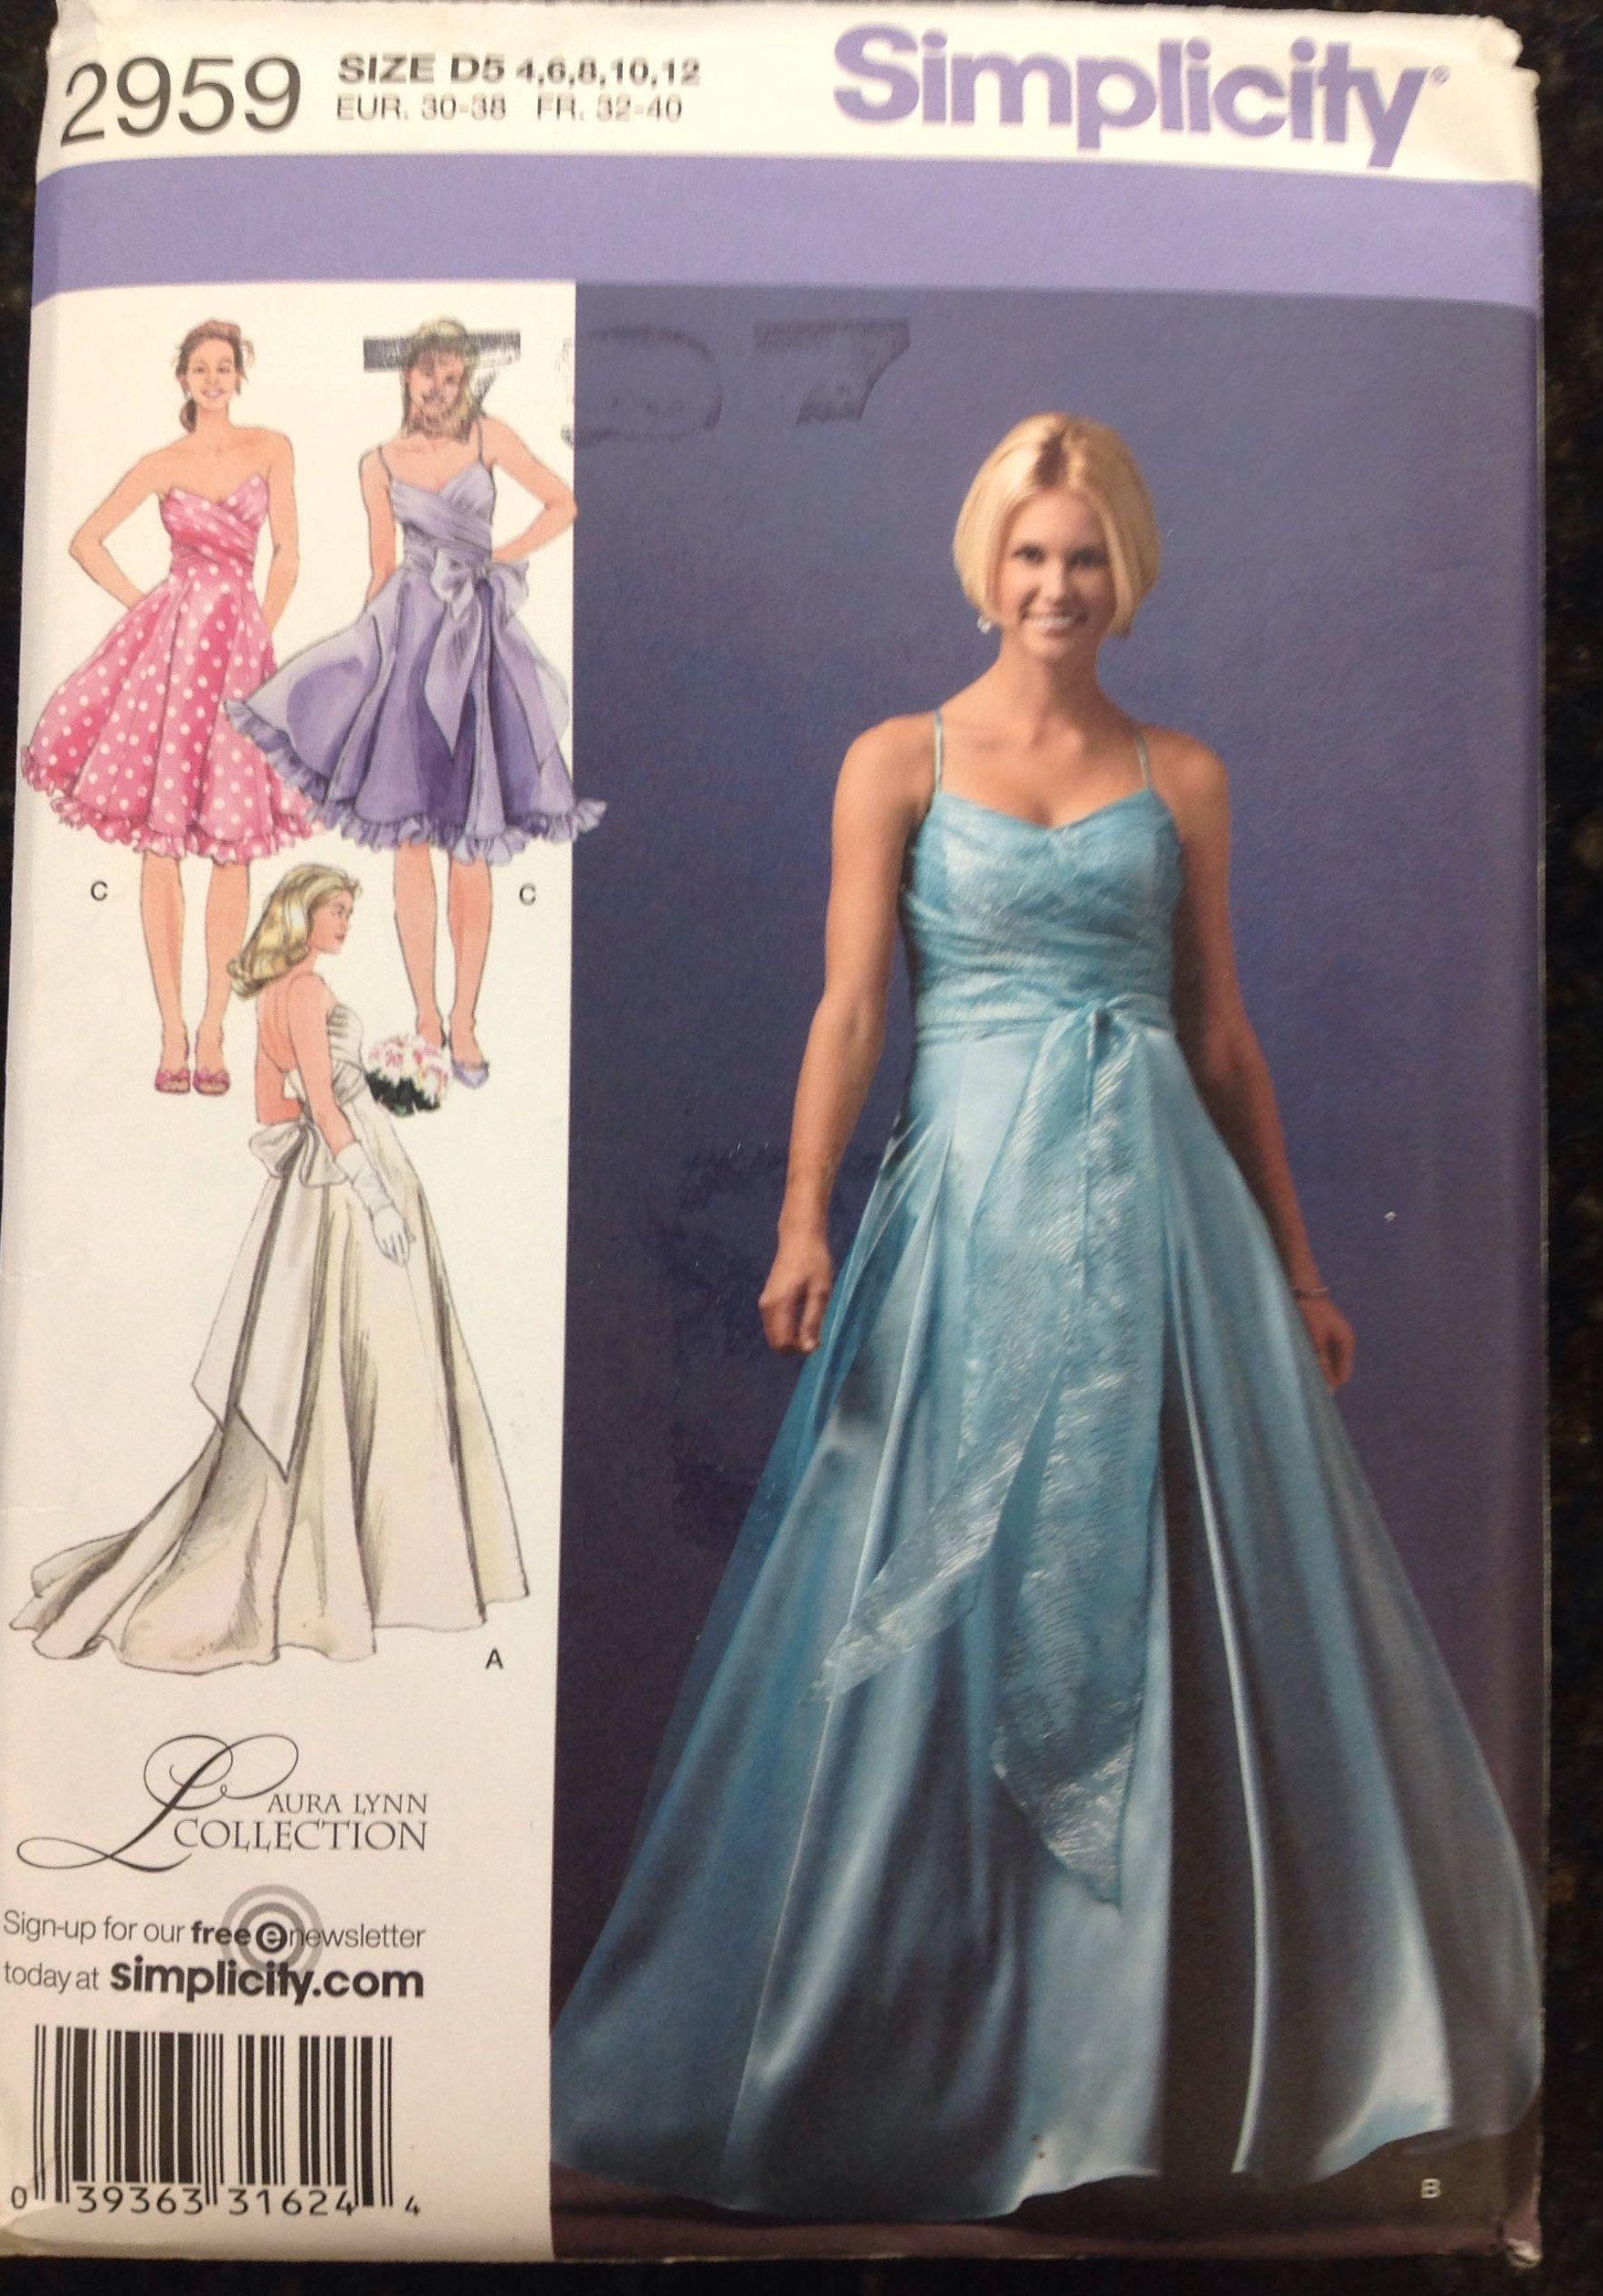 Strapless or spaghetti strap wedding bridesmaid or prom dress knee